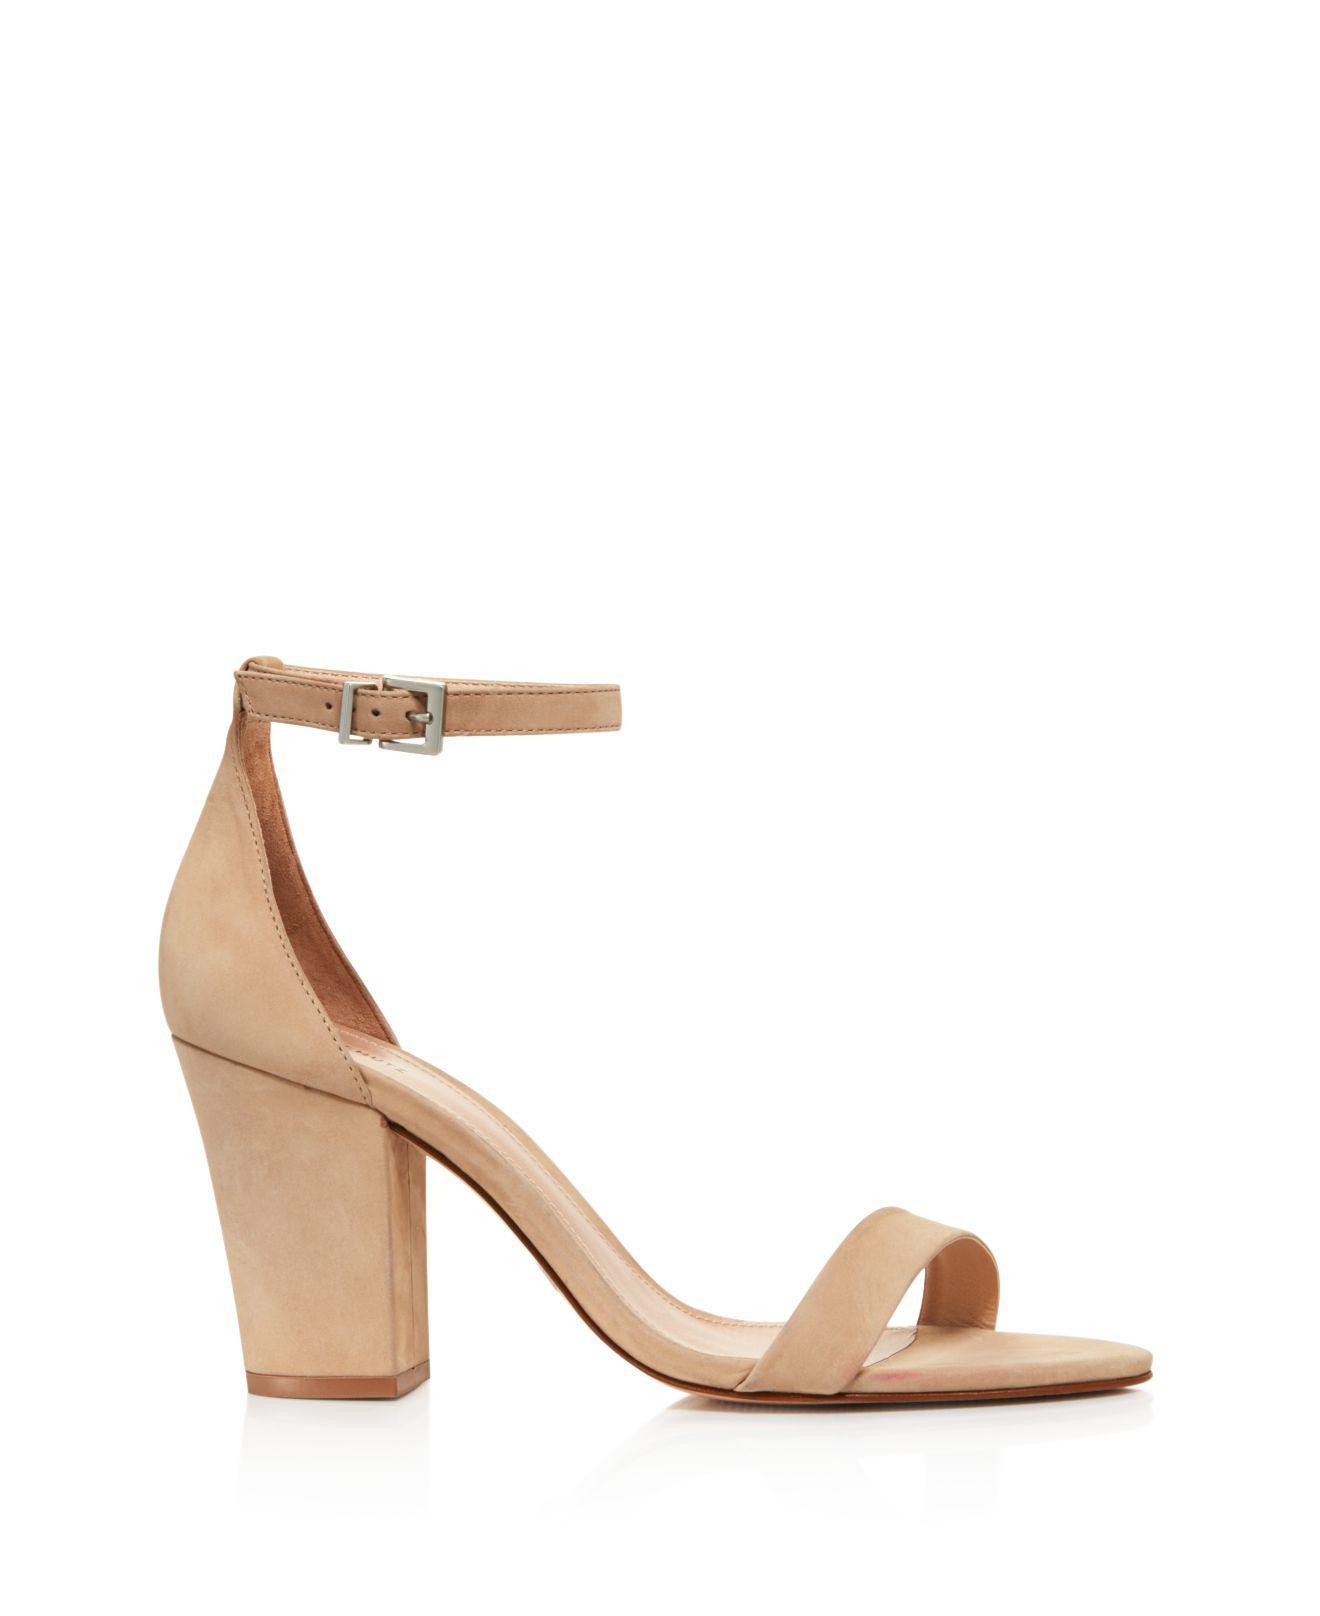 Schutz Women's Enida Suede Block Heel Ankle Strap Sandals M1ekKoza